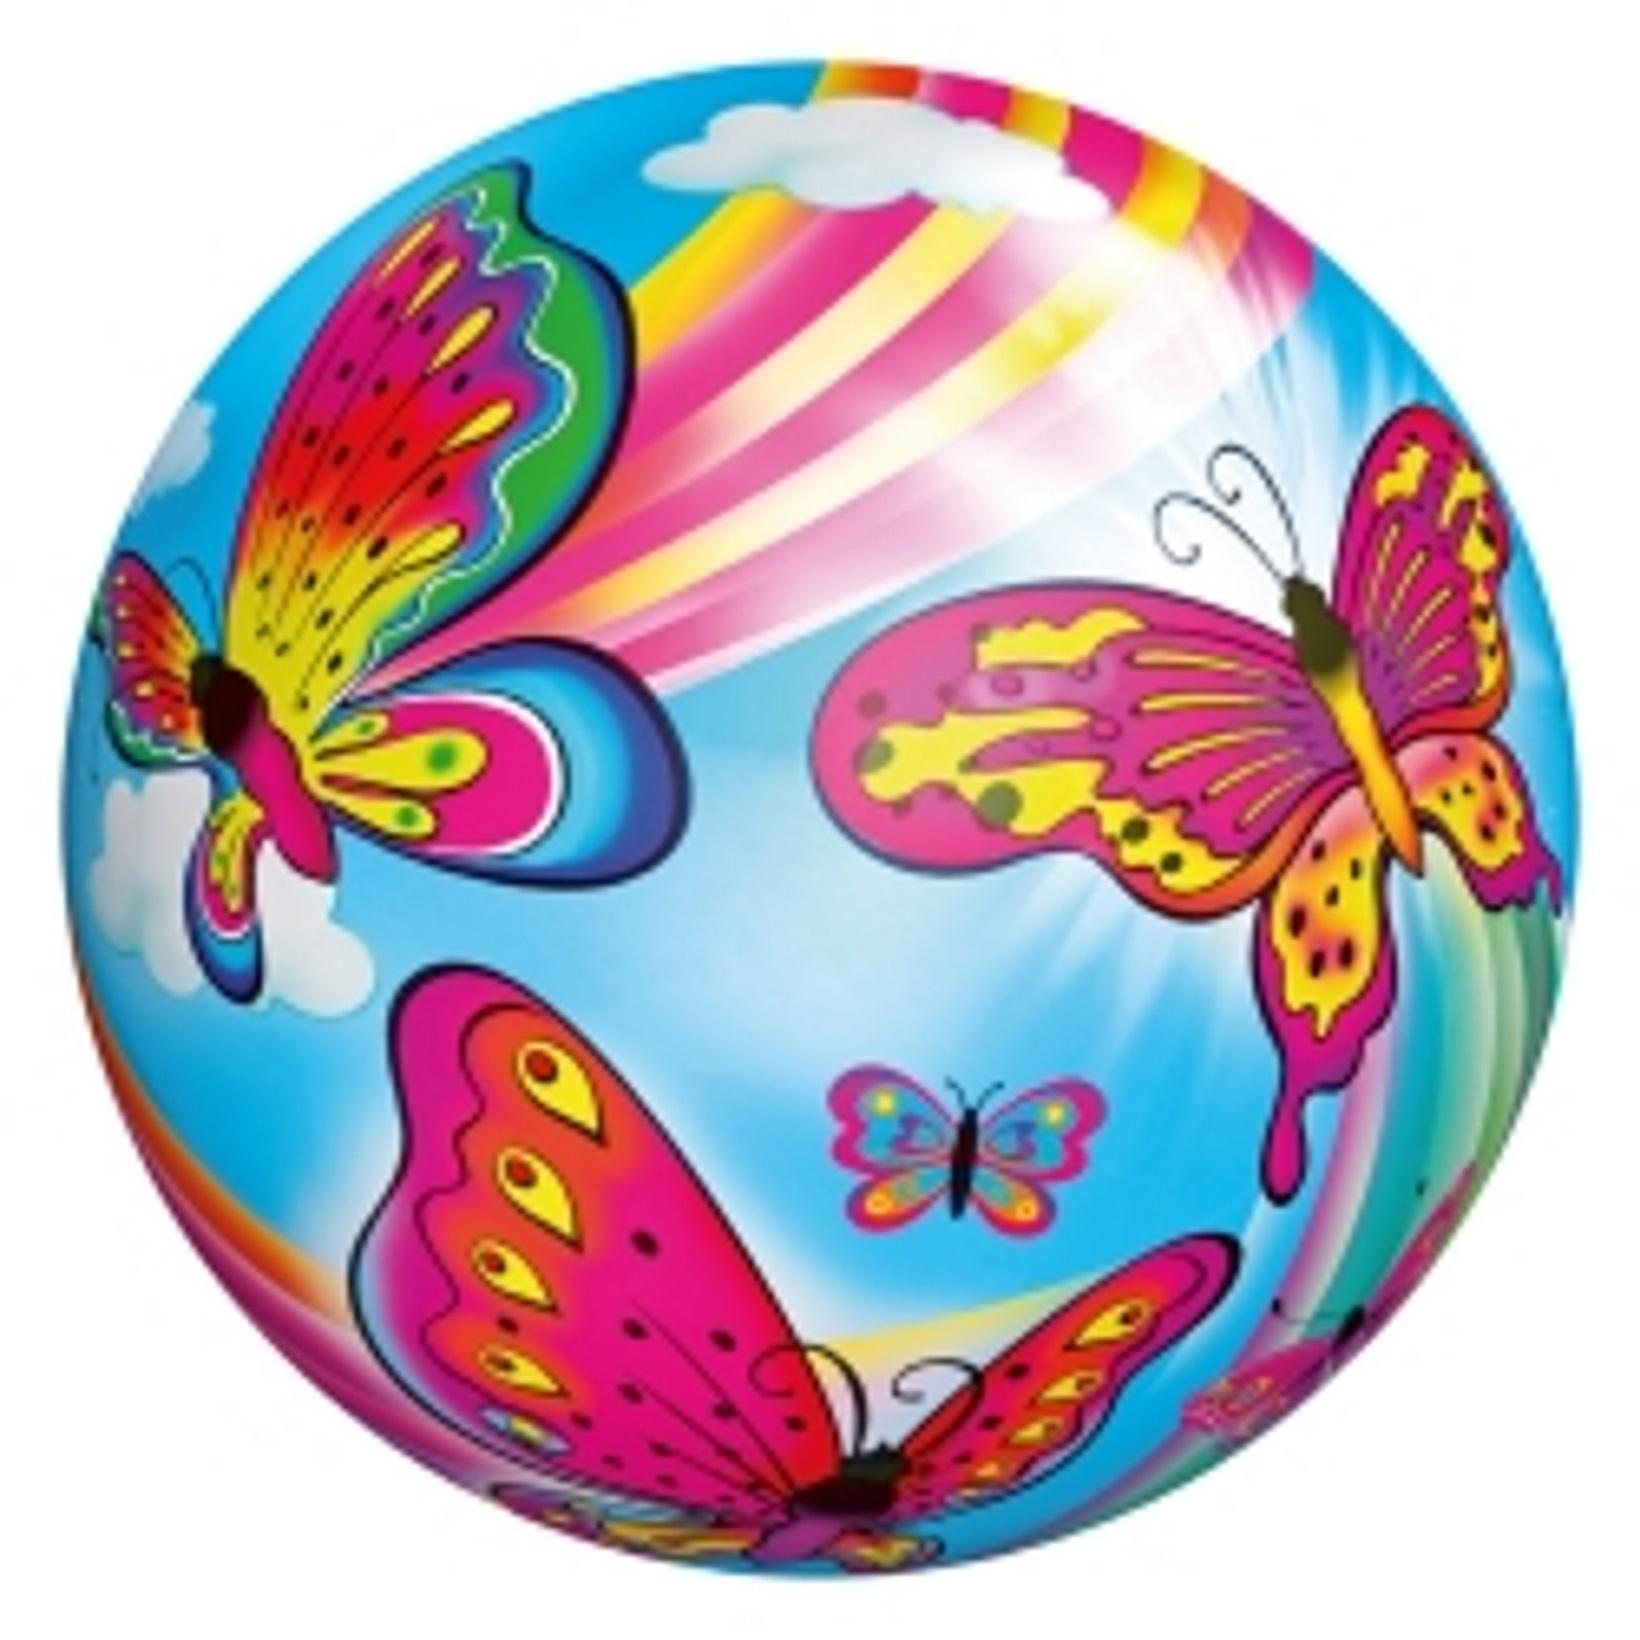 Schmetterling Buntball 18cm